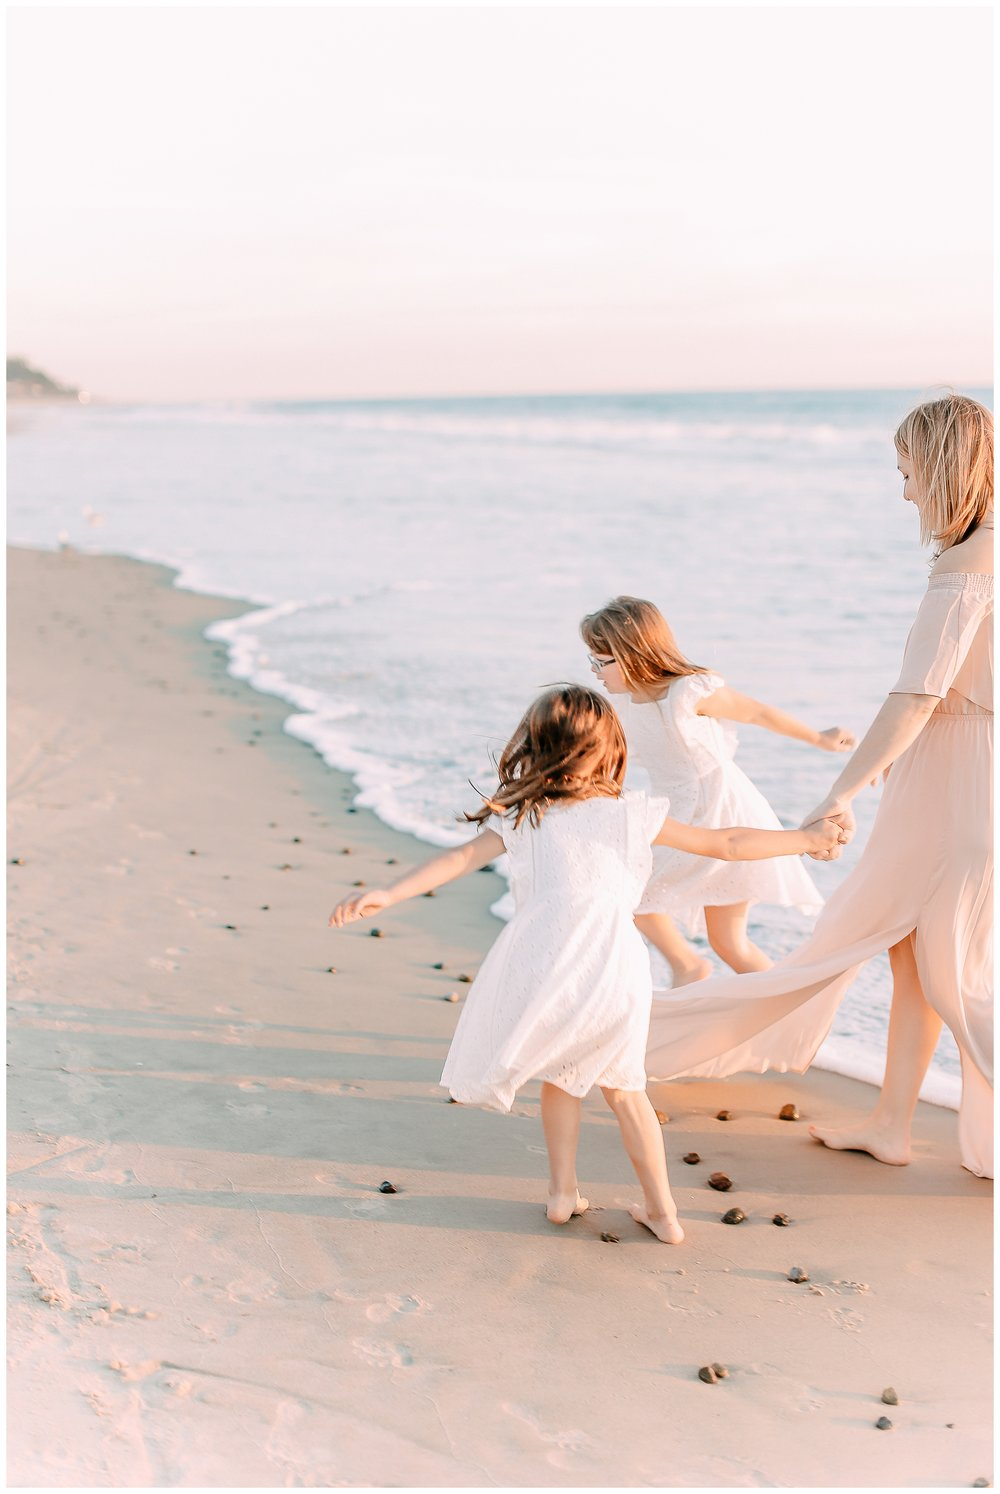 San_clemente_family_session_Orange_county_family_photographer_cori_kleckner_photography_laguna_beach_family_session_0684.jpg